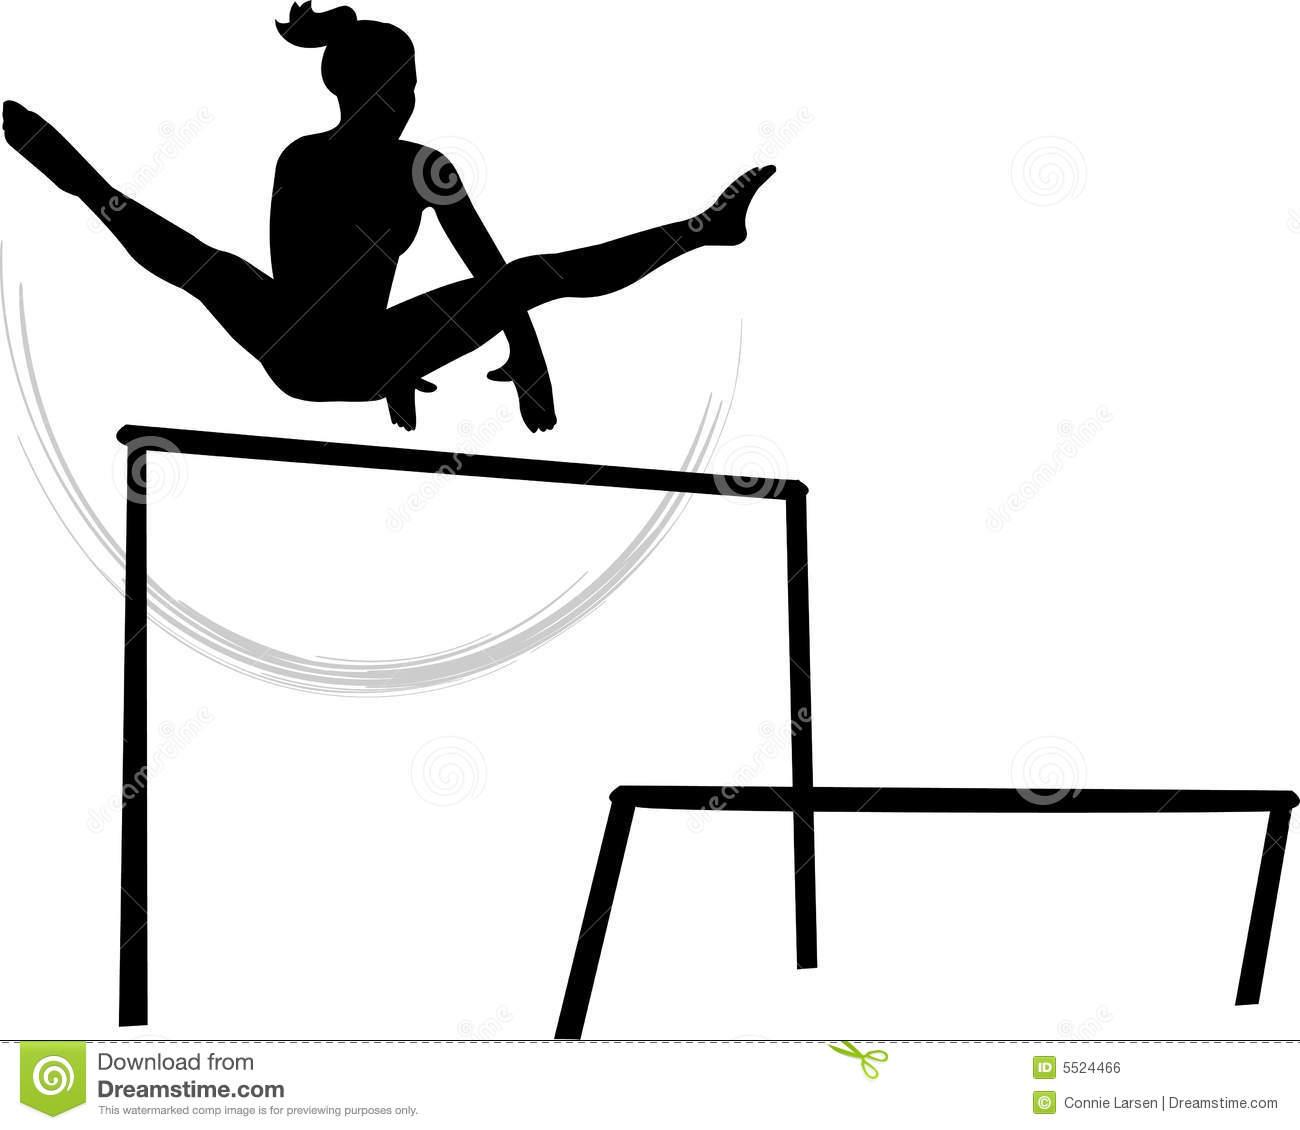 Girl gymastics vault clipart svg black and white library Gymnastics Bars Clipart - Clipart Kid svg black and white library